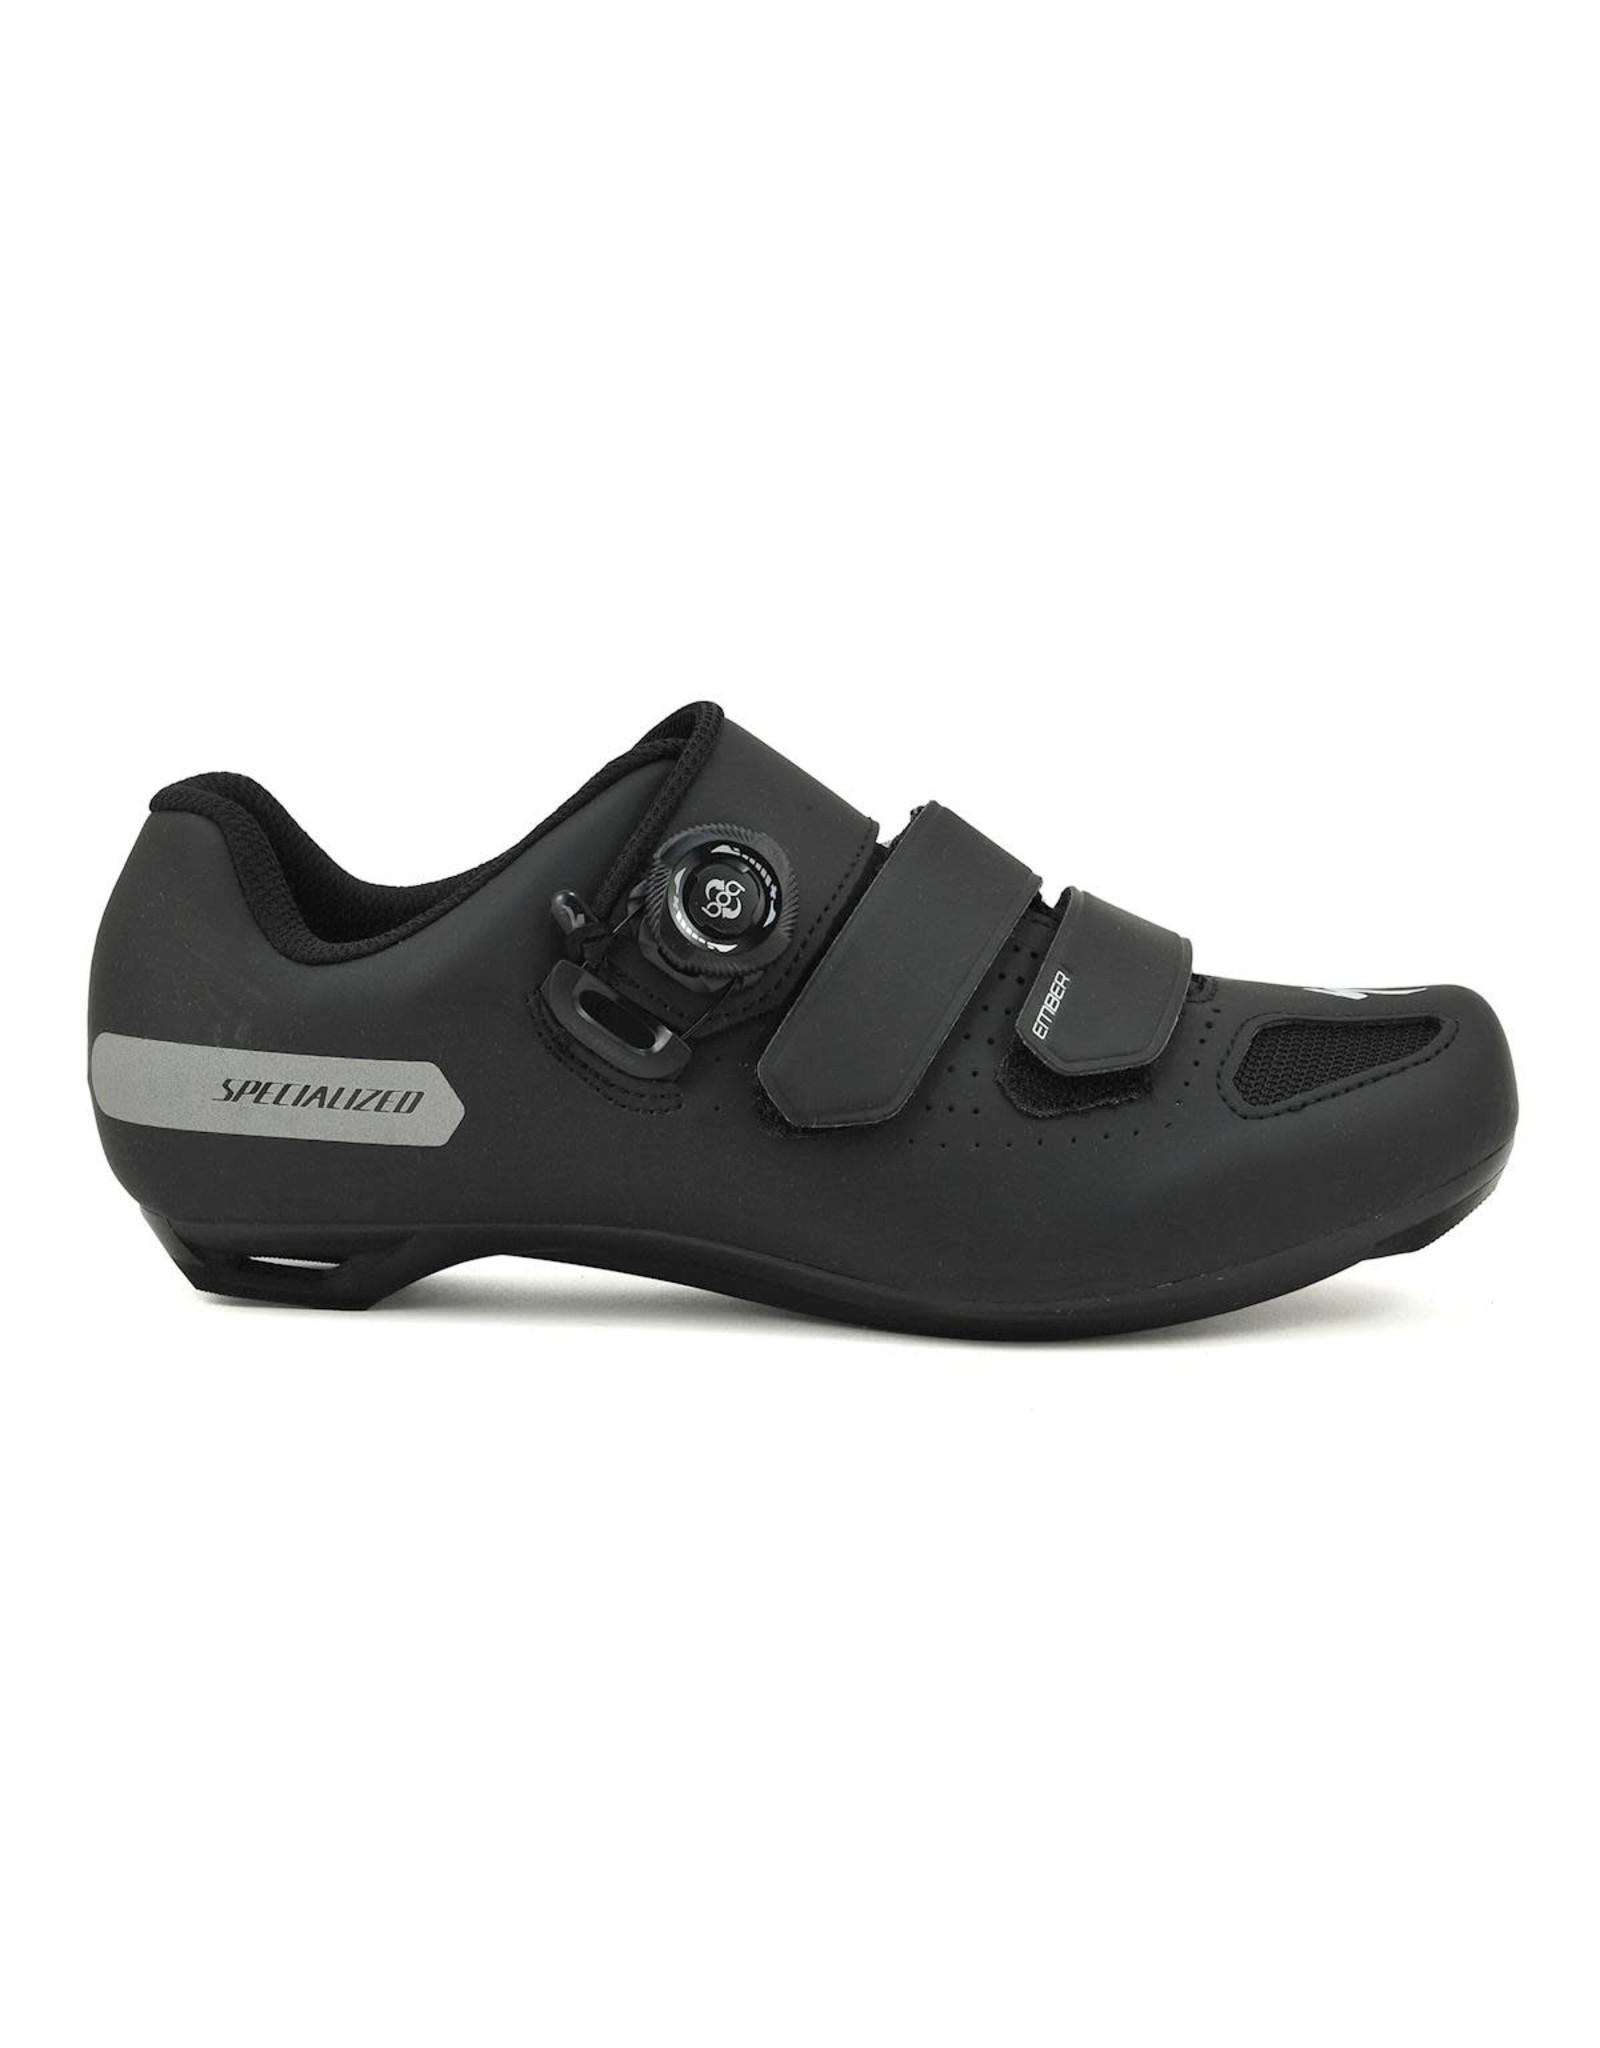 Specialized Shoe Spec Ember RD  Wmn Blk 36/5.75